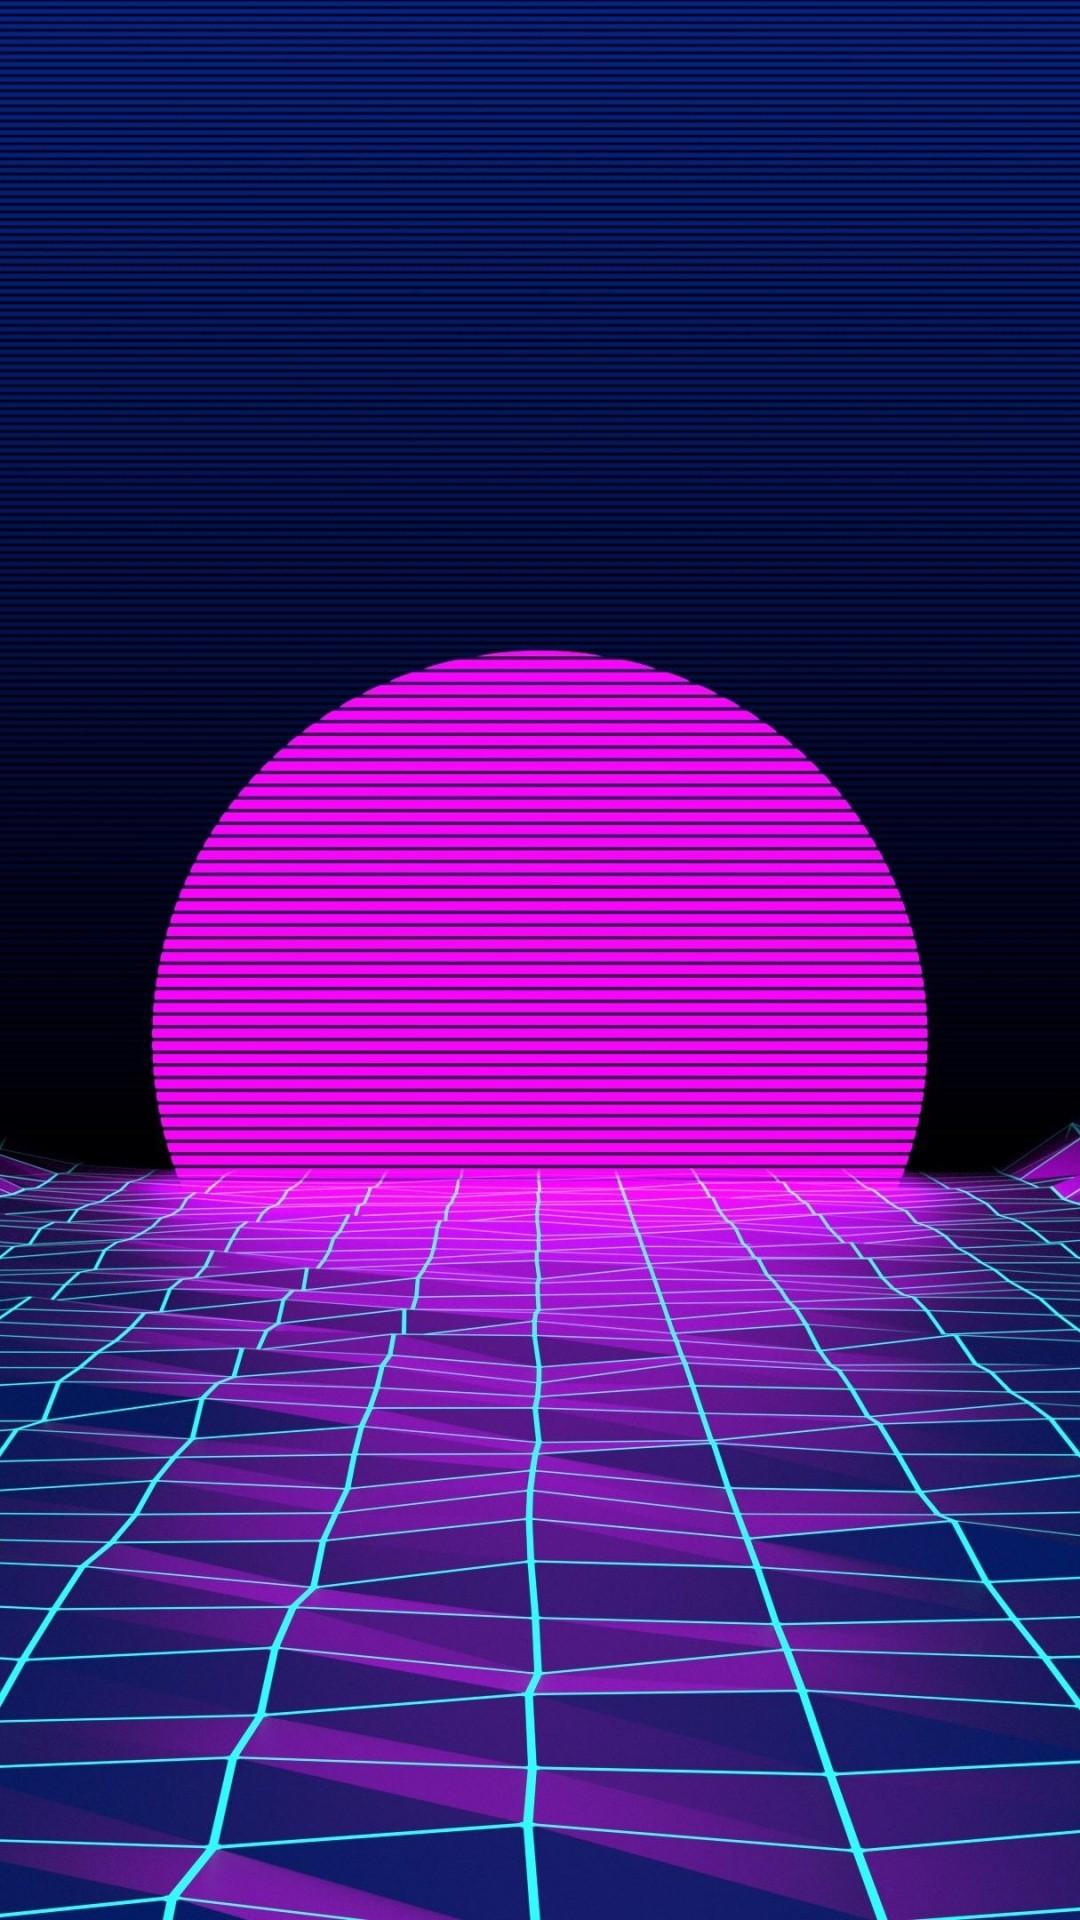 Neon phone background